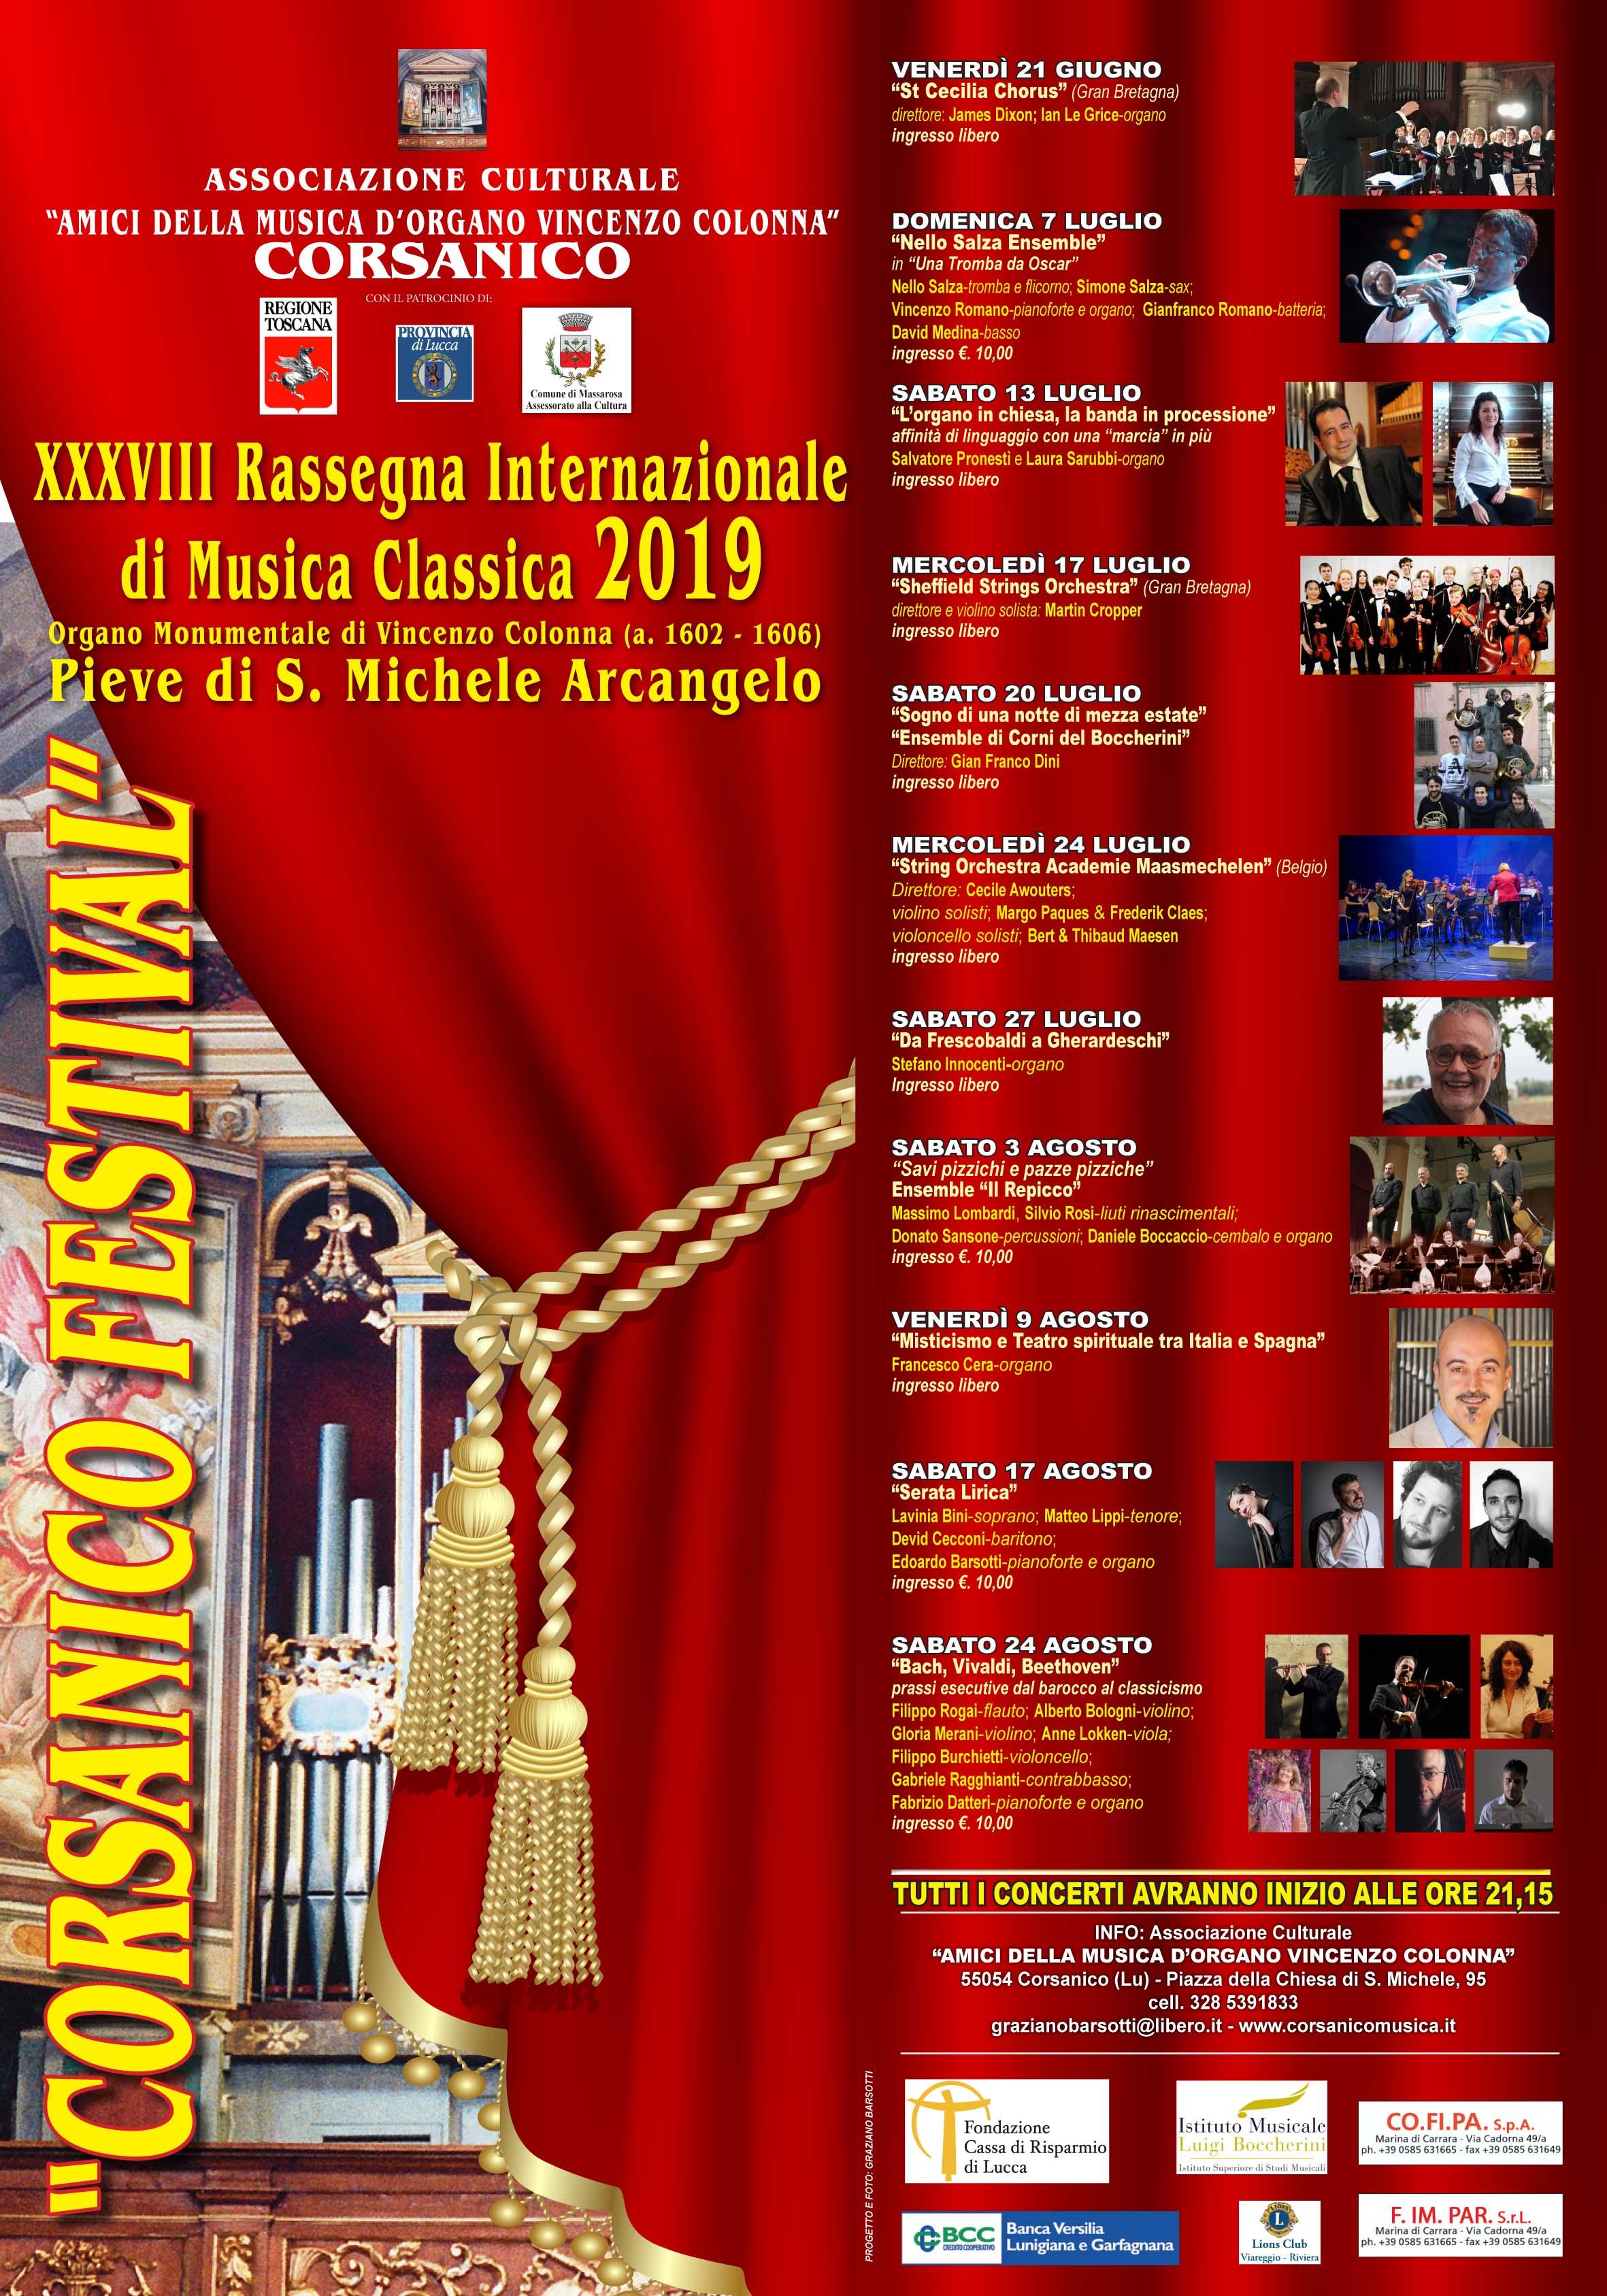 Corsanico Festival